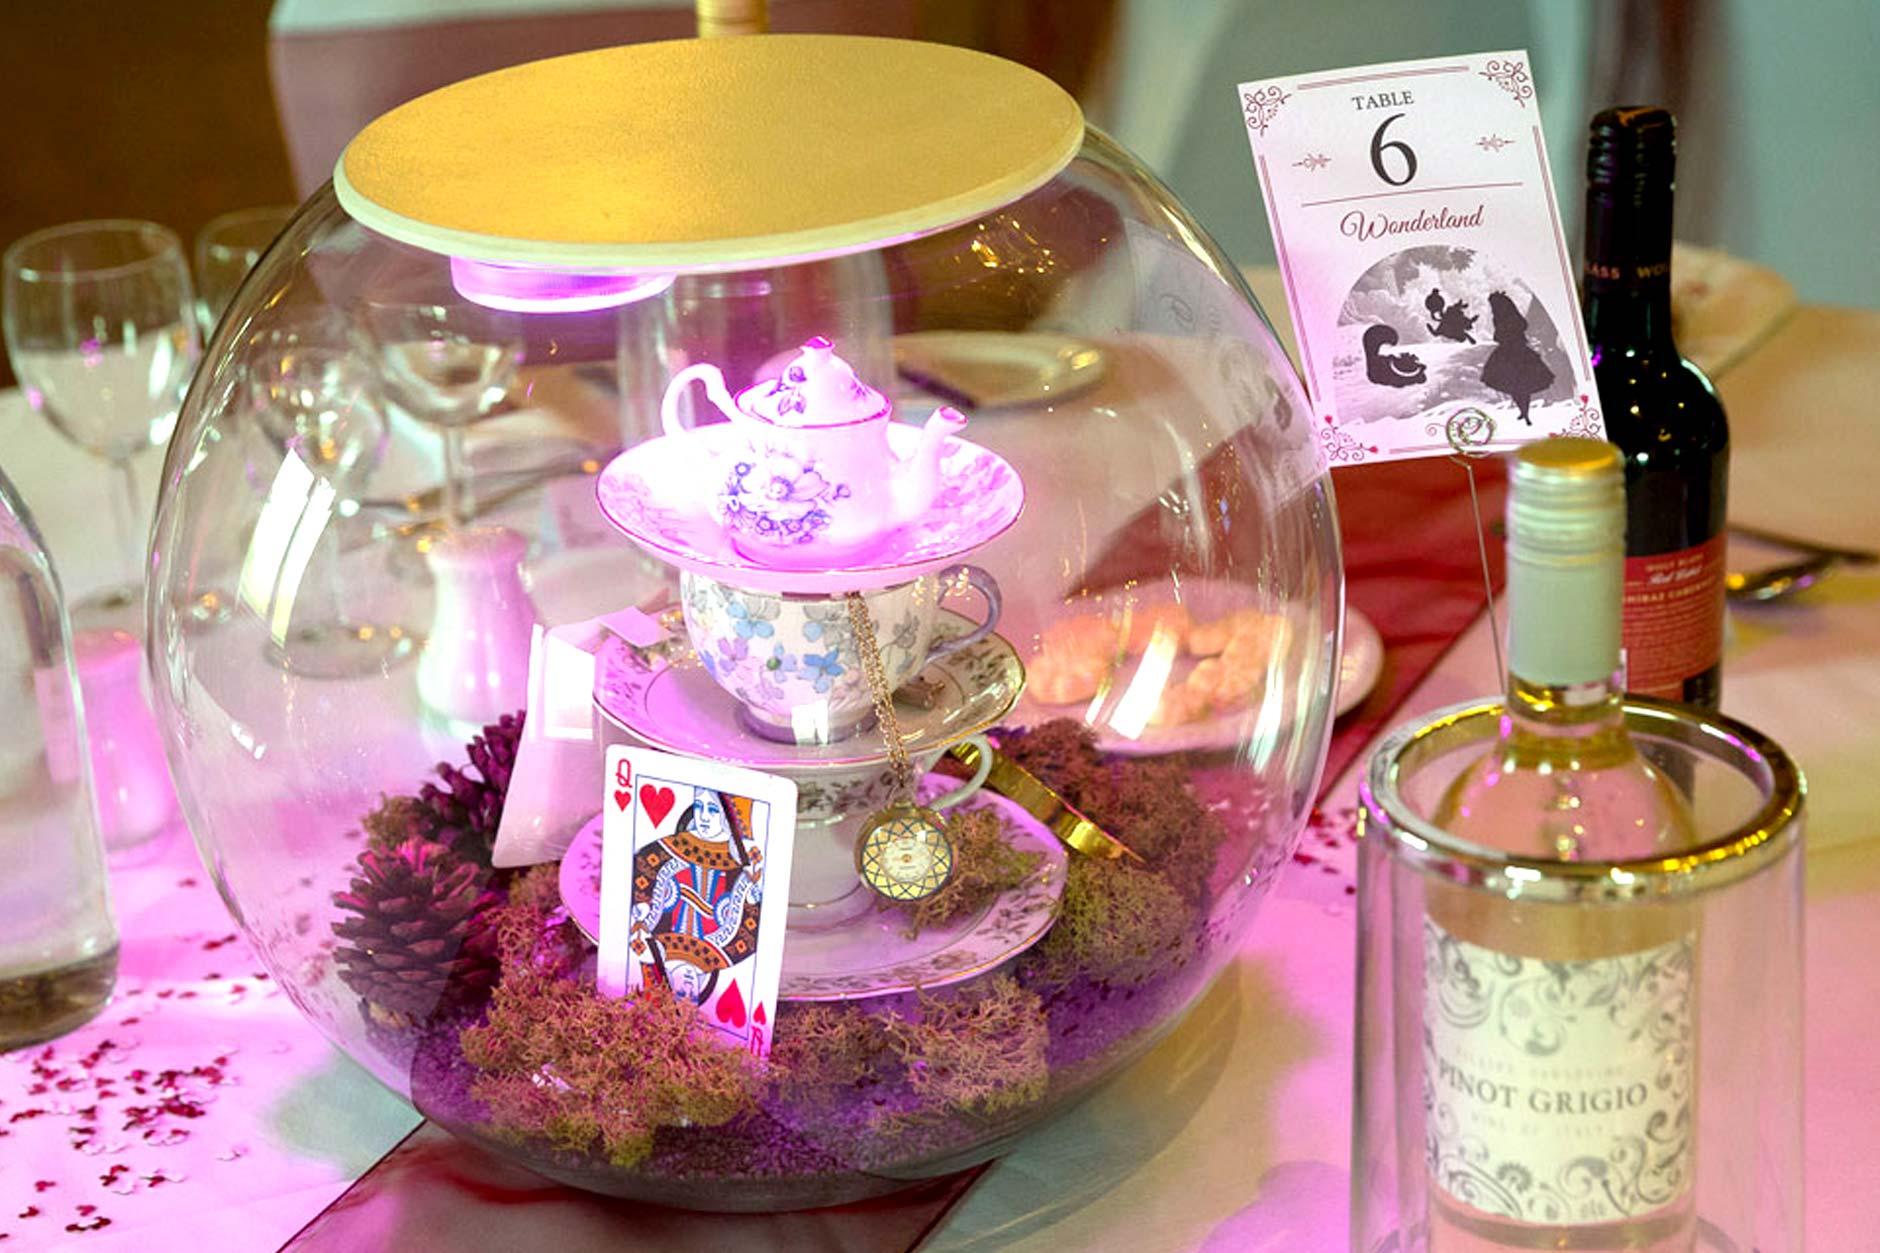 Teaparty in Wonderland\